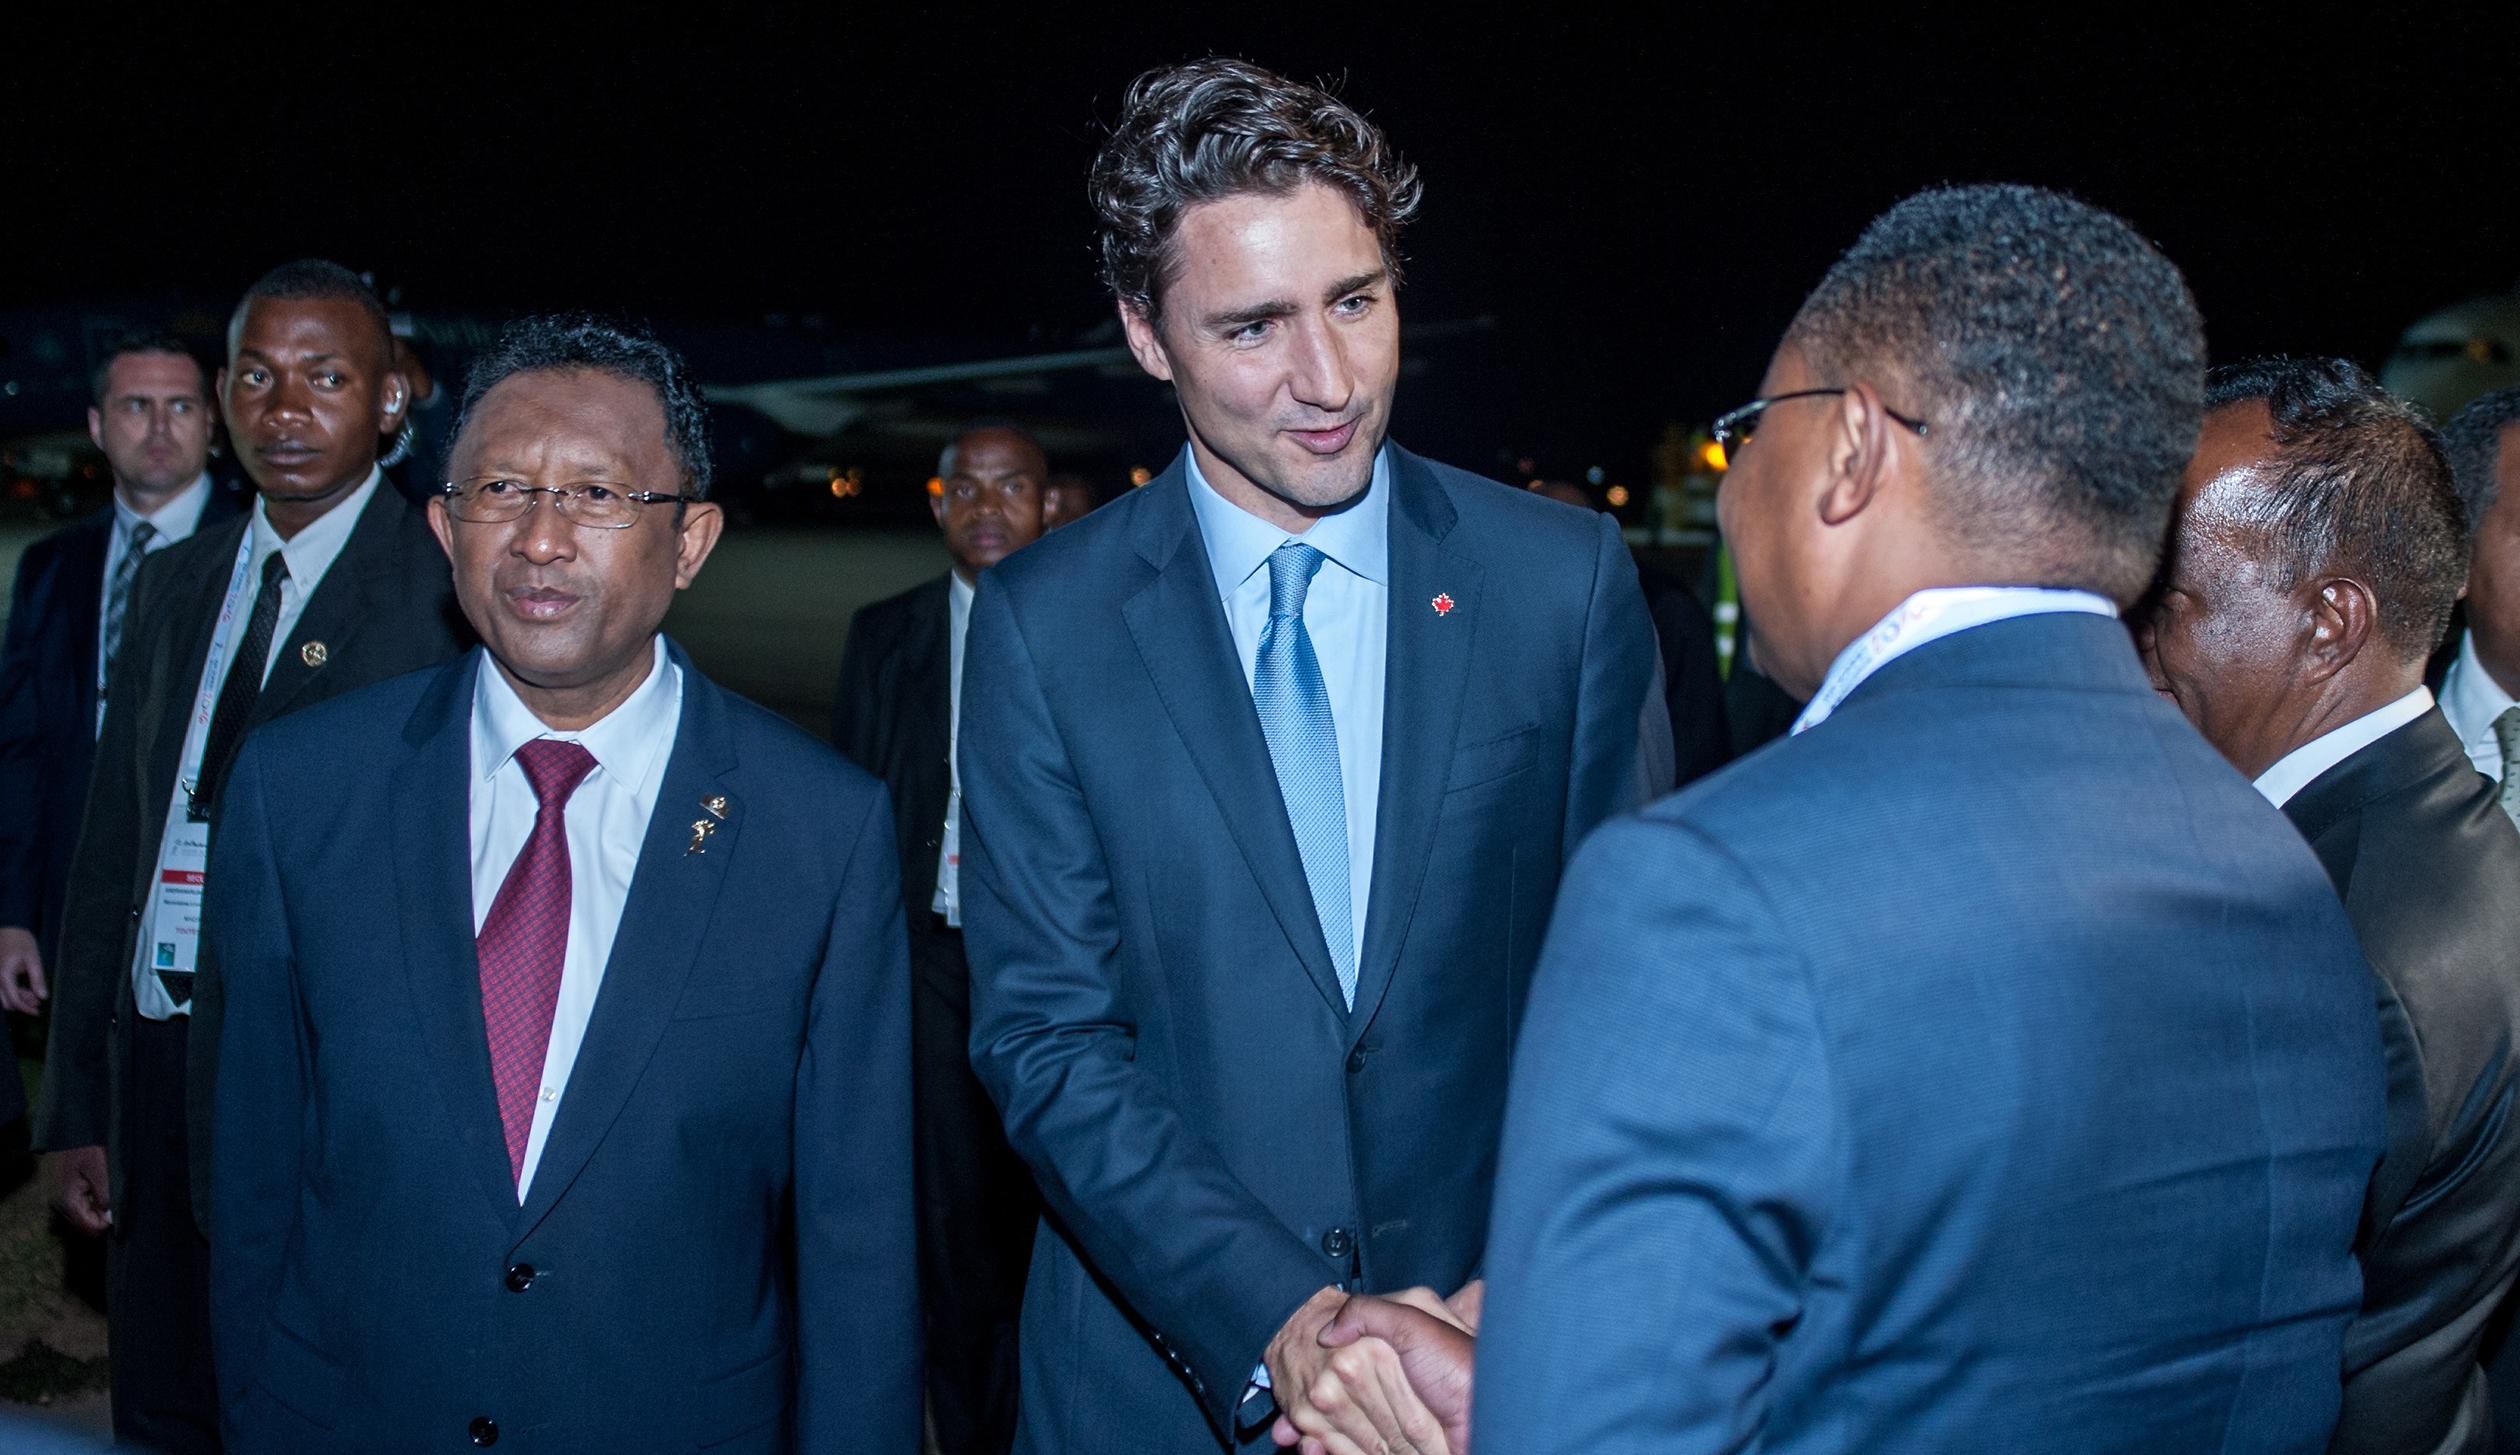 Canadian Prime Minister Justin Trudeau in Madagascar